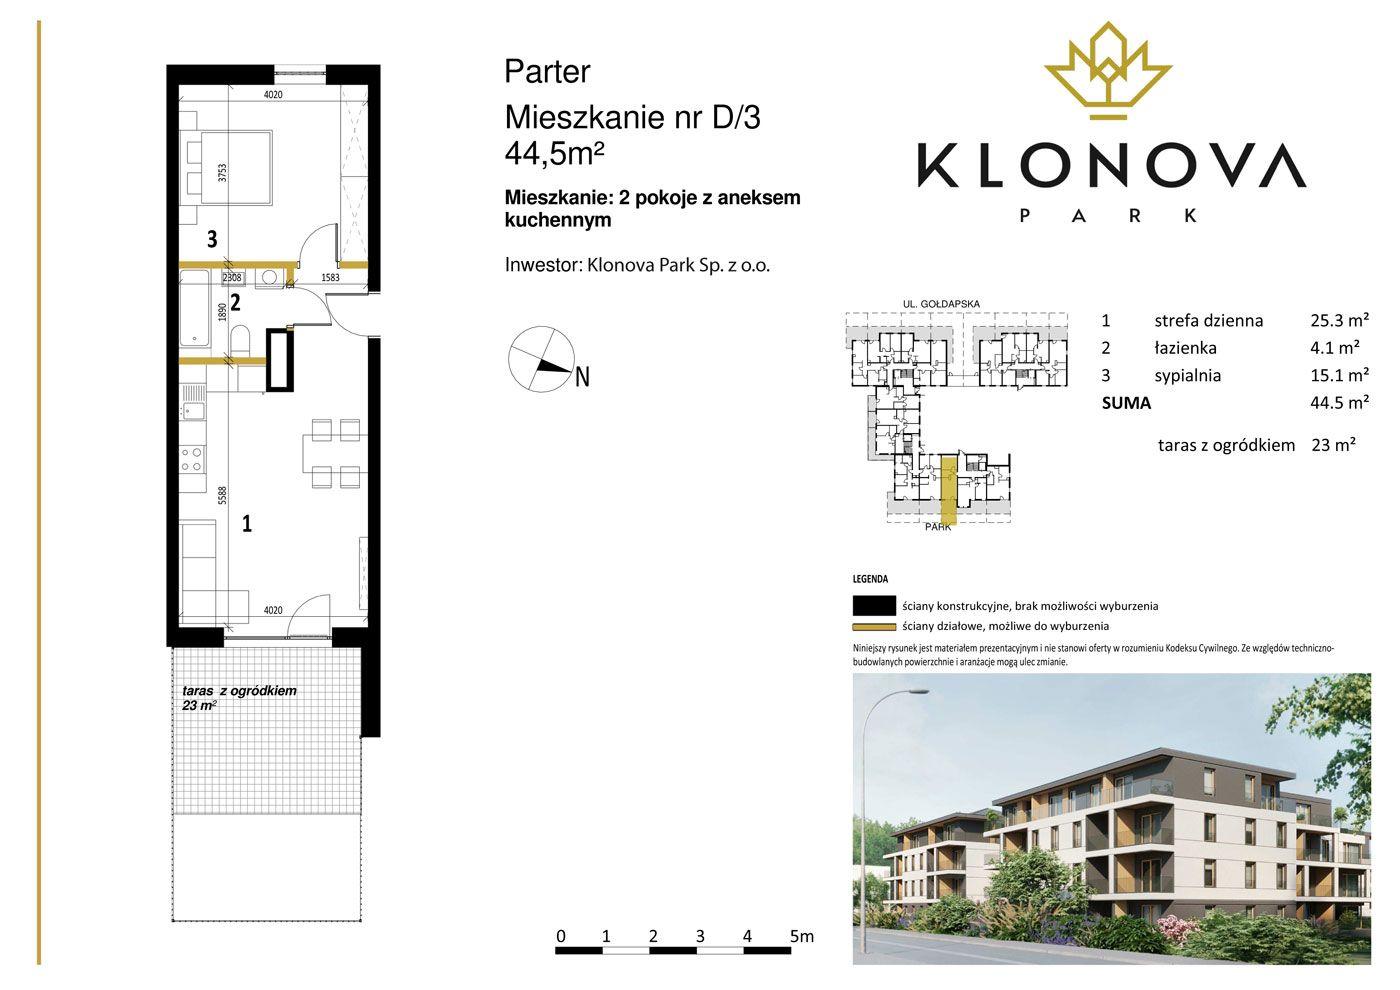 Apartamenty Klonova Park - Plan mieszkania D/3